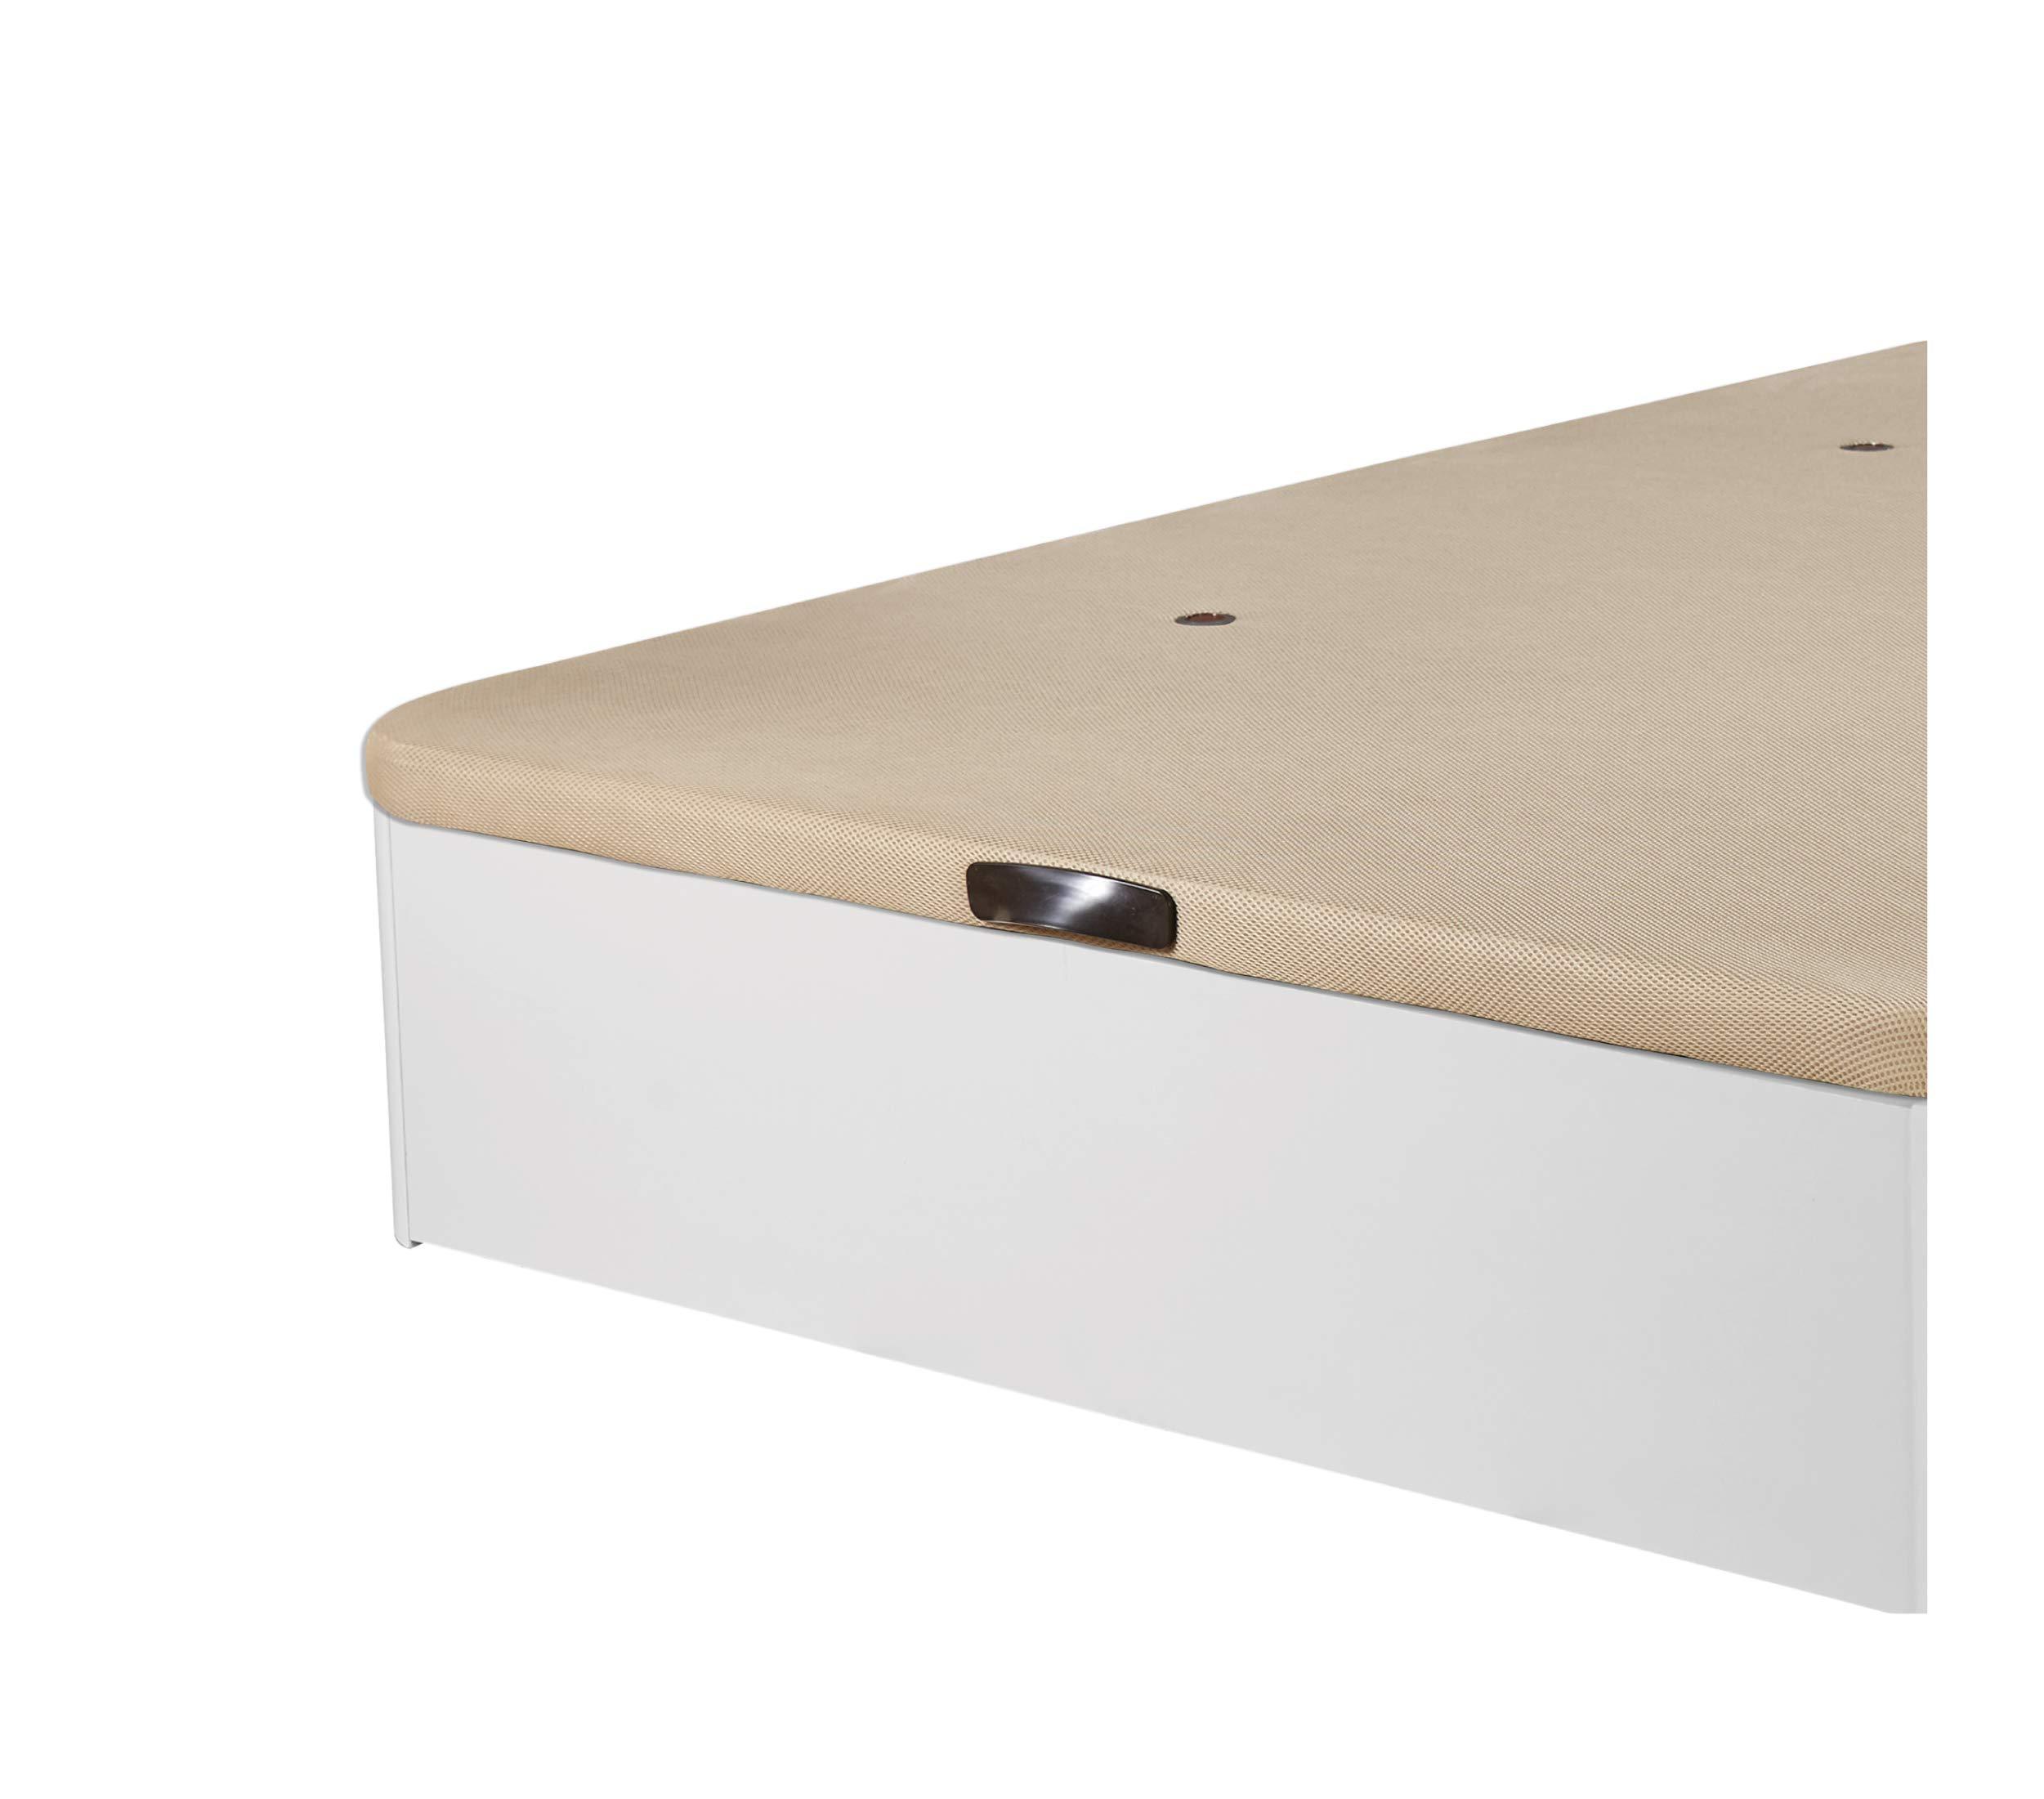 90x180 Blanco, 22mm DHOME Canape Abatible Tapizado 3D 4 v/álvulas Maxima Calidad Esquinas canap/é Madera